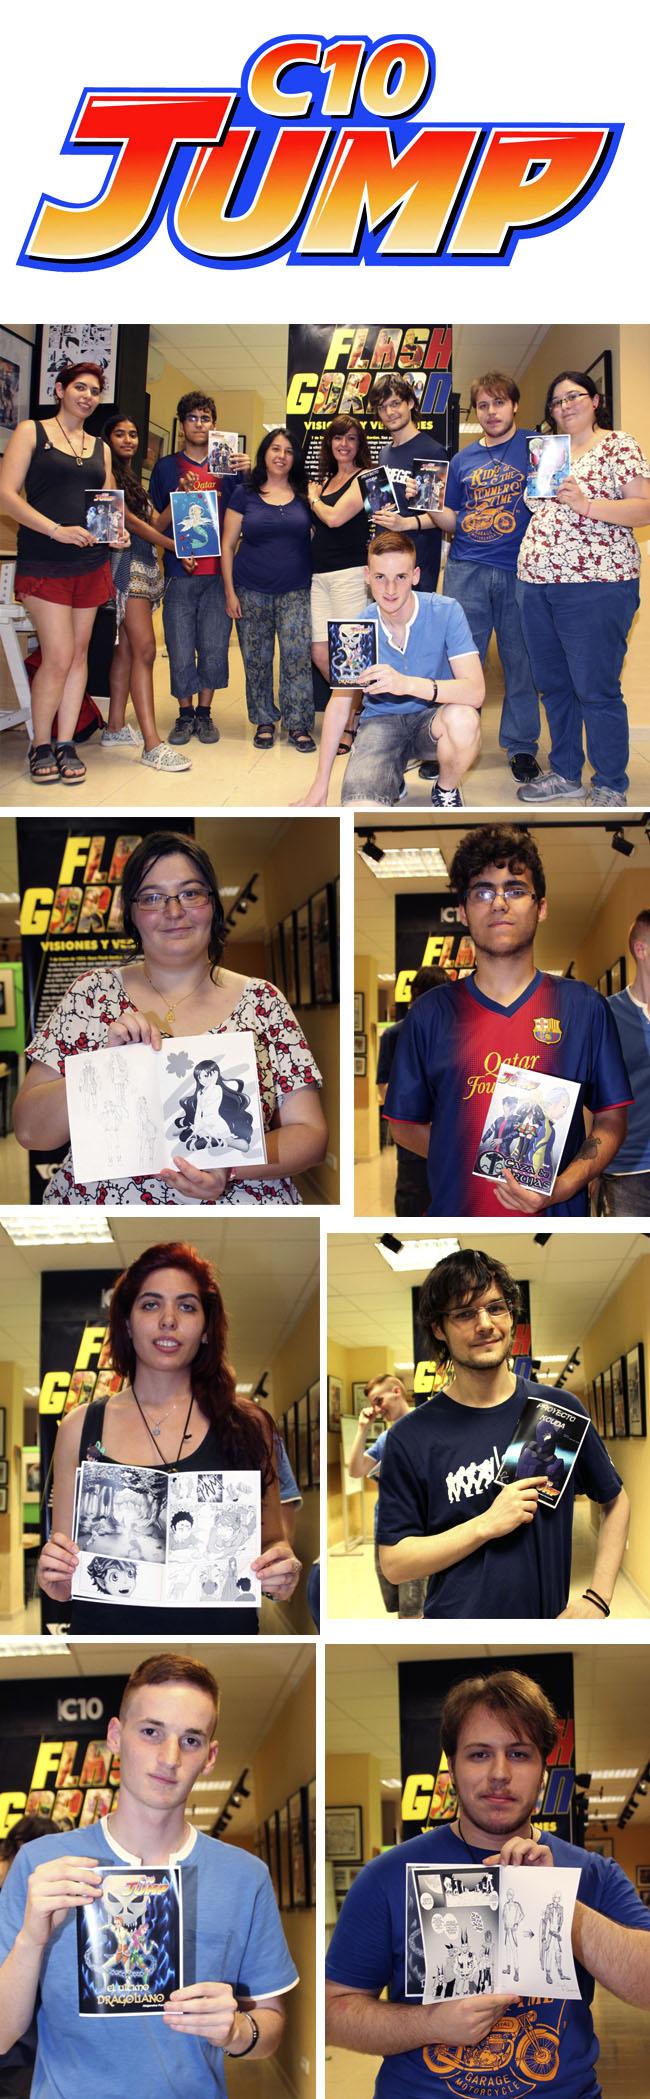 curso-manga-comic-trabajos-alumnos-madrid-academiac10